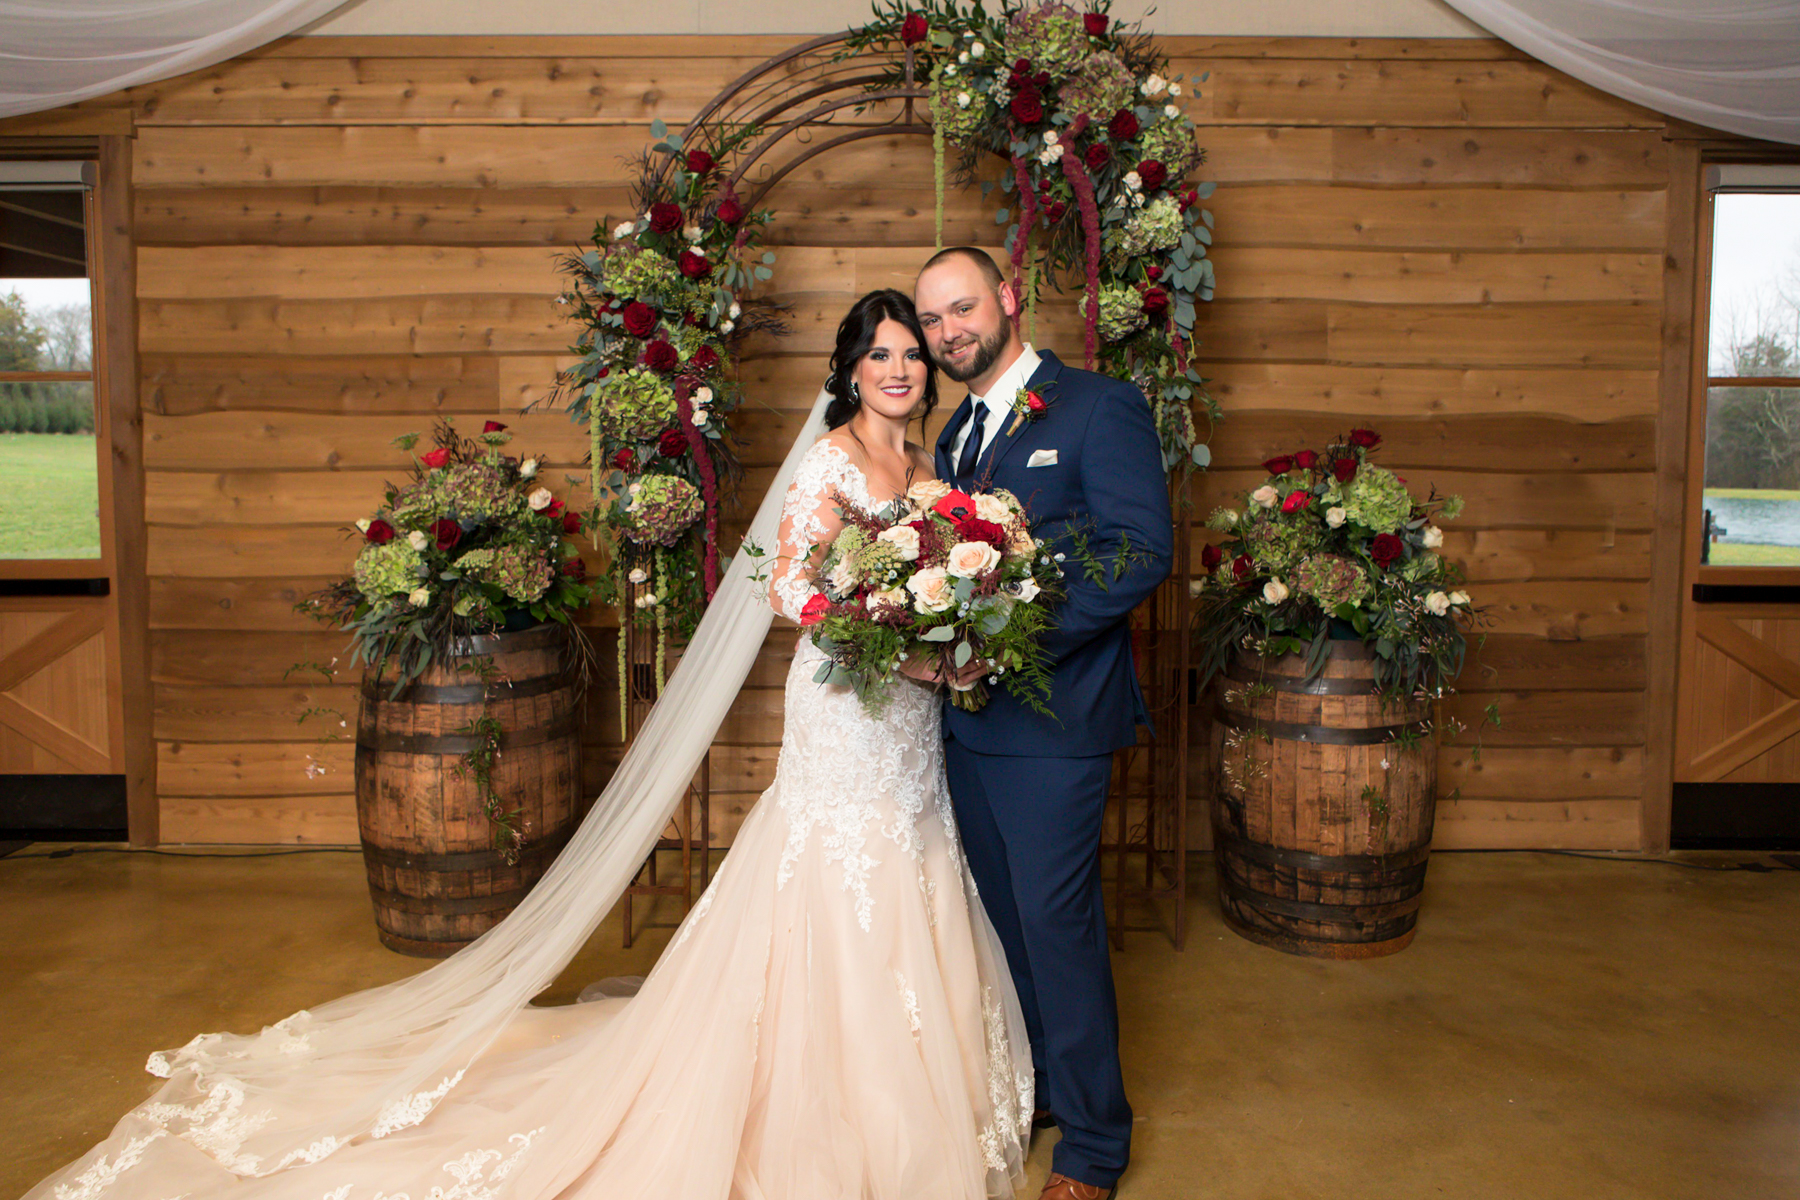 The-Barn-at-Sycamore-Farms-wedding-Shawn-and-Hayden-0292.jpg